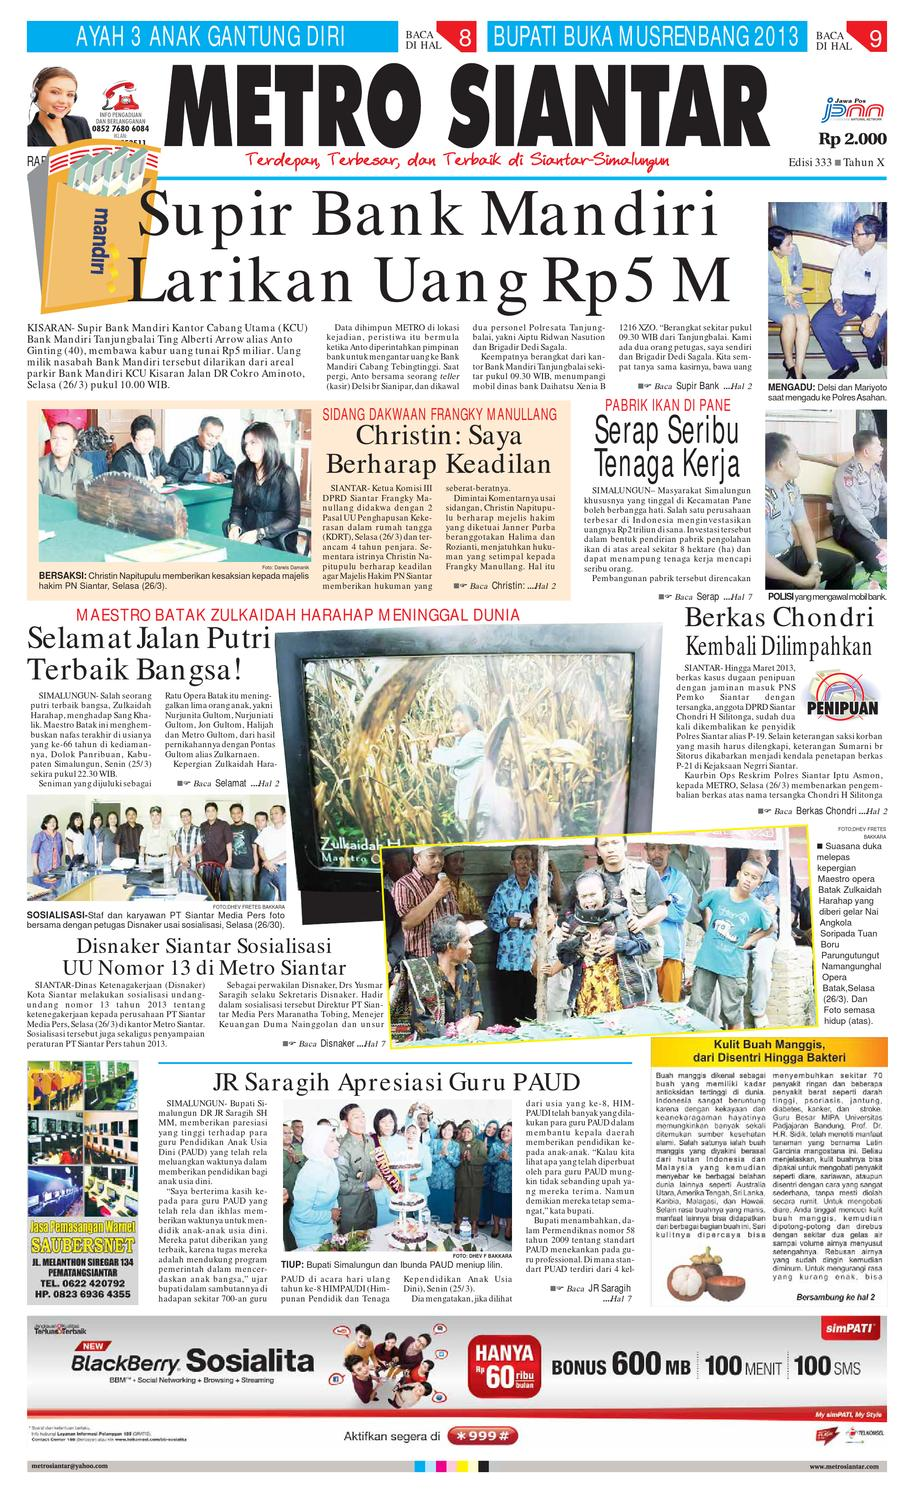 Epaper Metro Siantar Online By Issuu Rkb Tegal Produk Ukm Bumn Emping Ubi